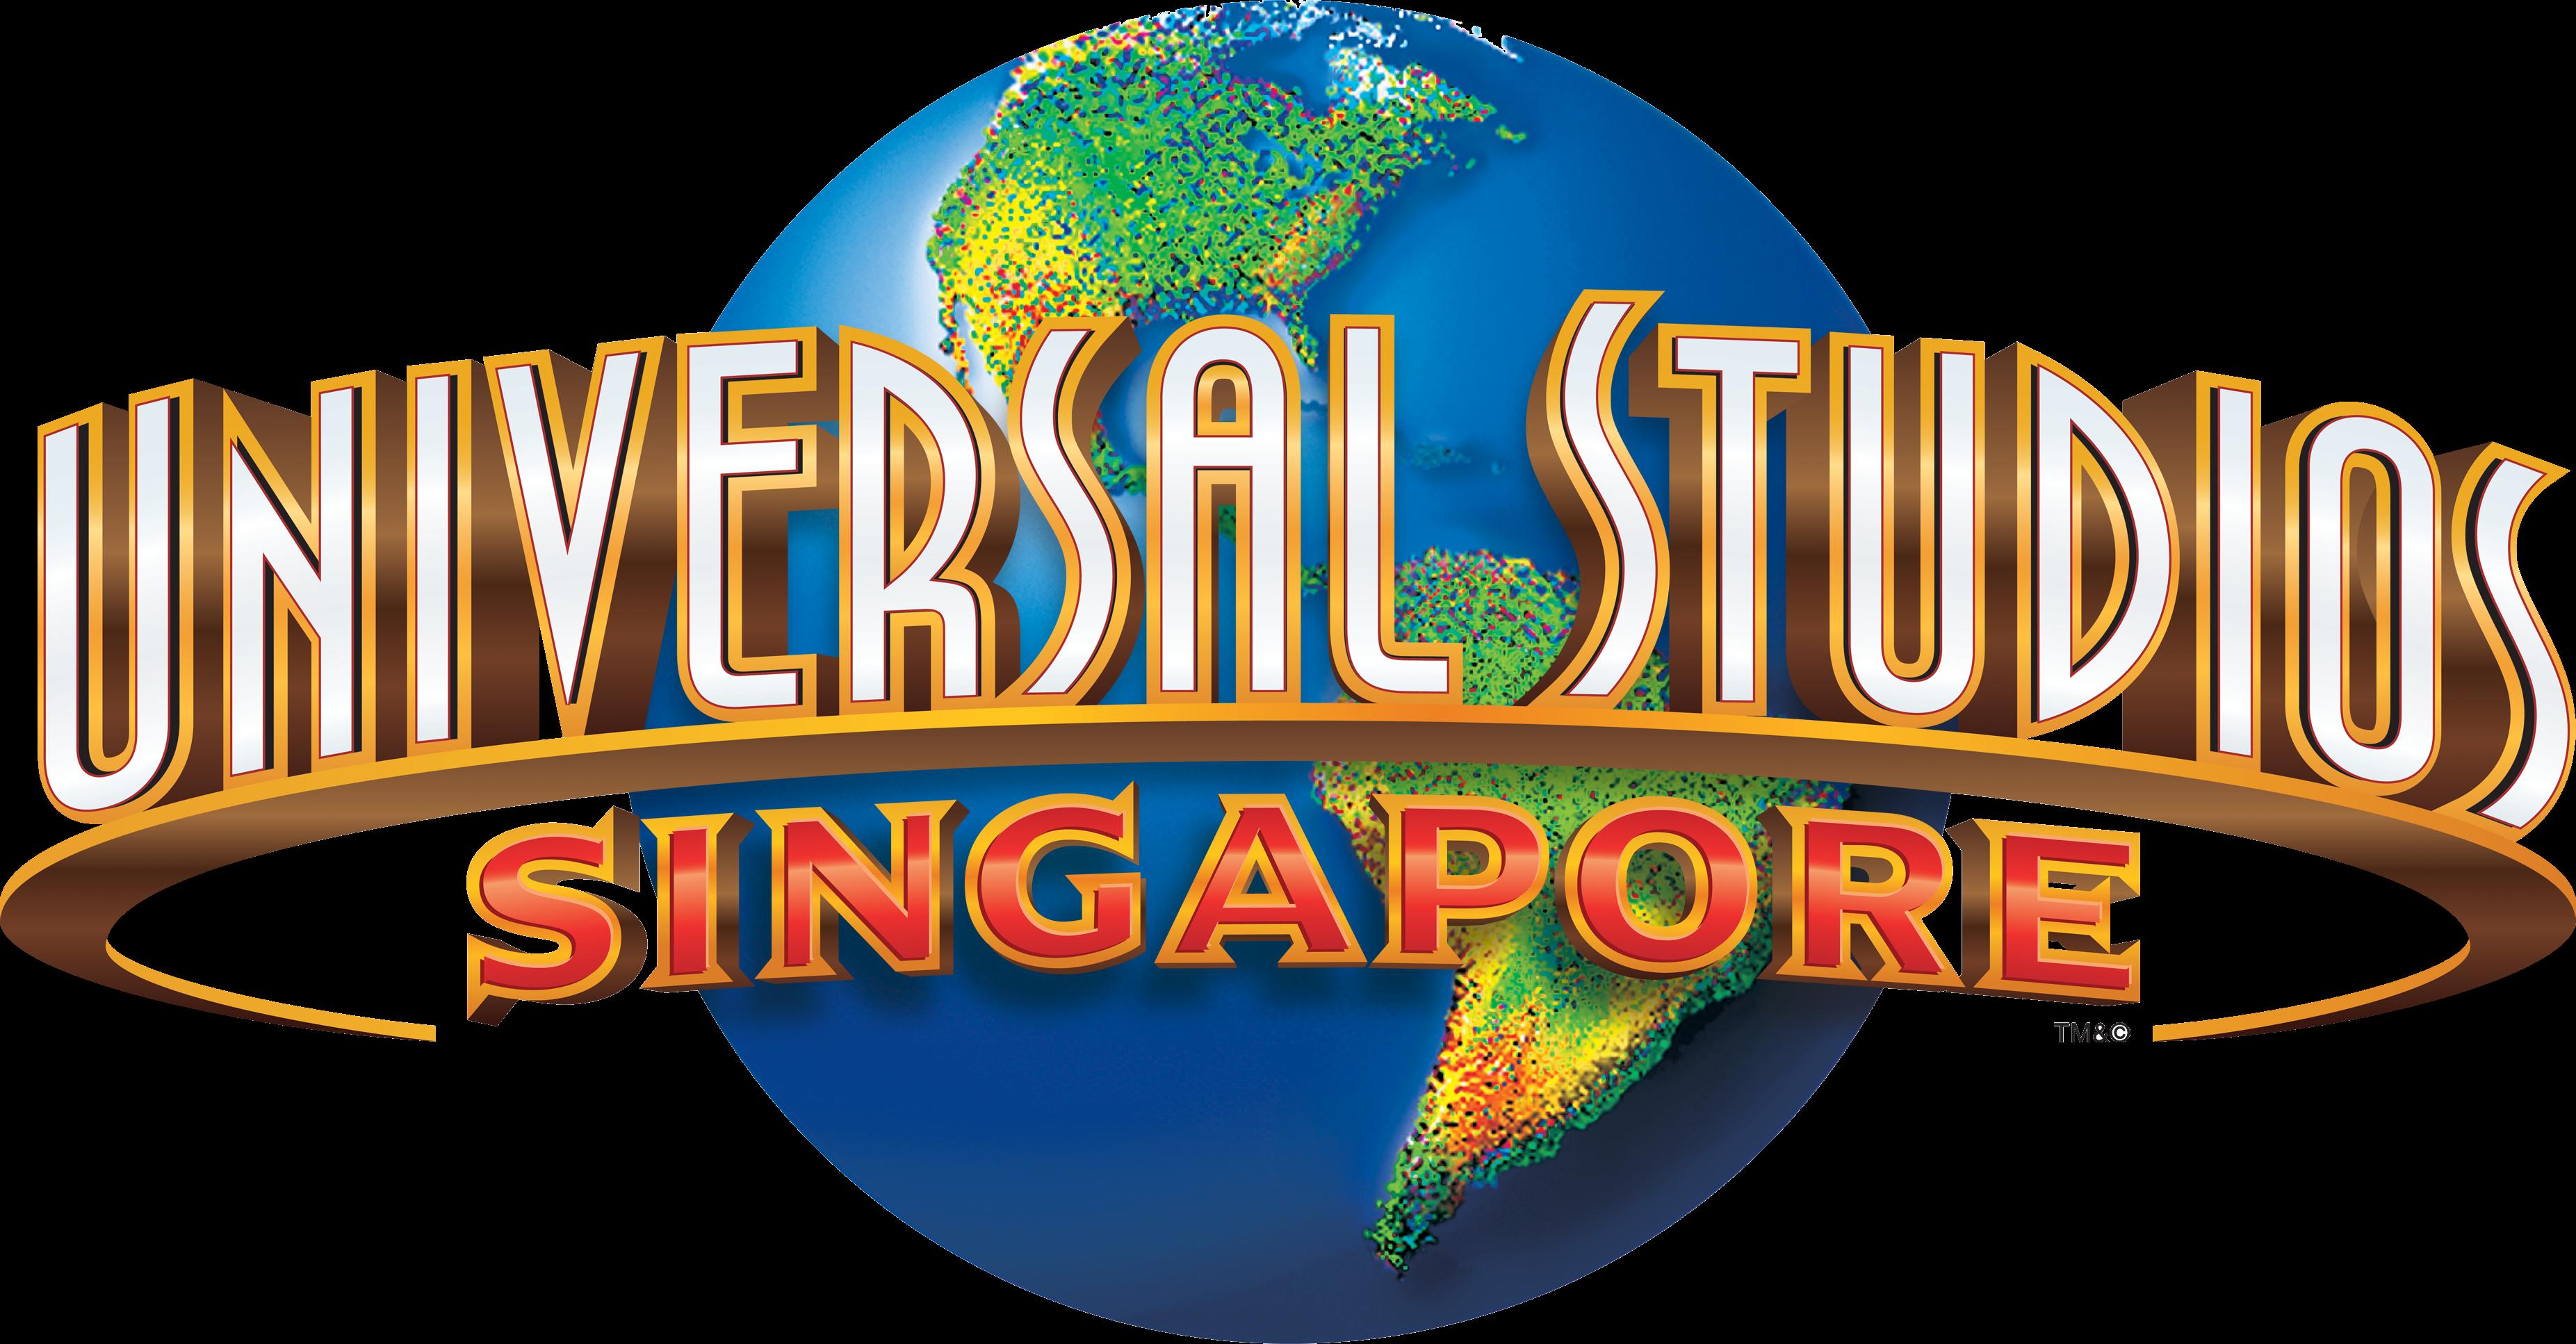 Download Ride Studios Singapore Universal Orlando.